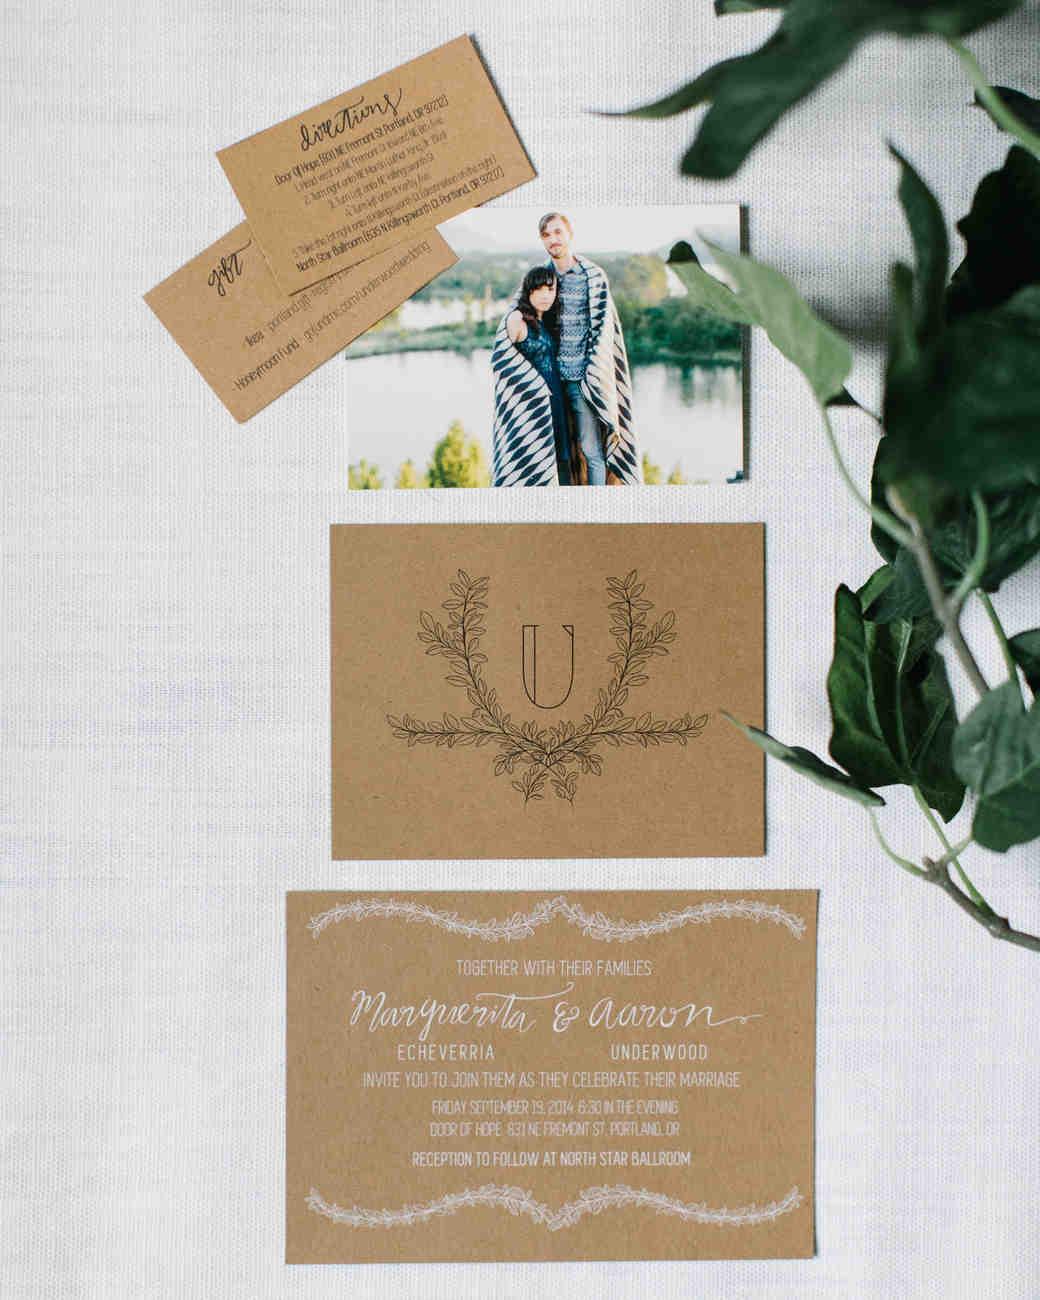 marguerita-aaron-wedding-invite-invite03-s111848-0214.jpg